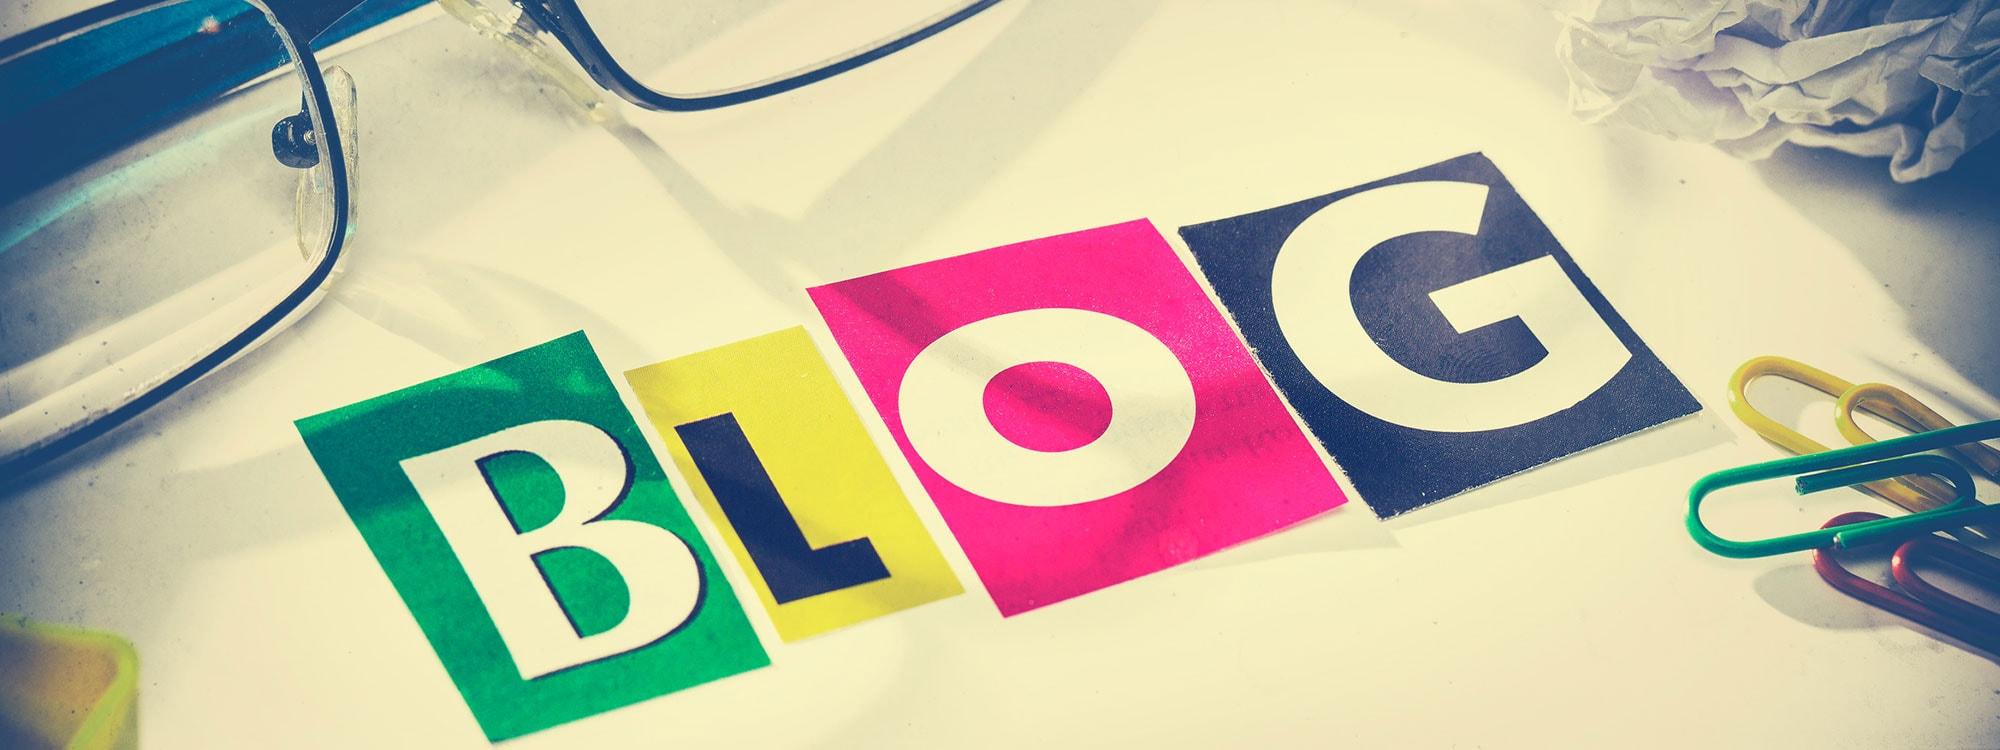 Un blog necesita planificare minutioasa si monitorizare constanta